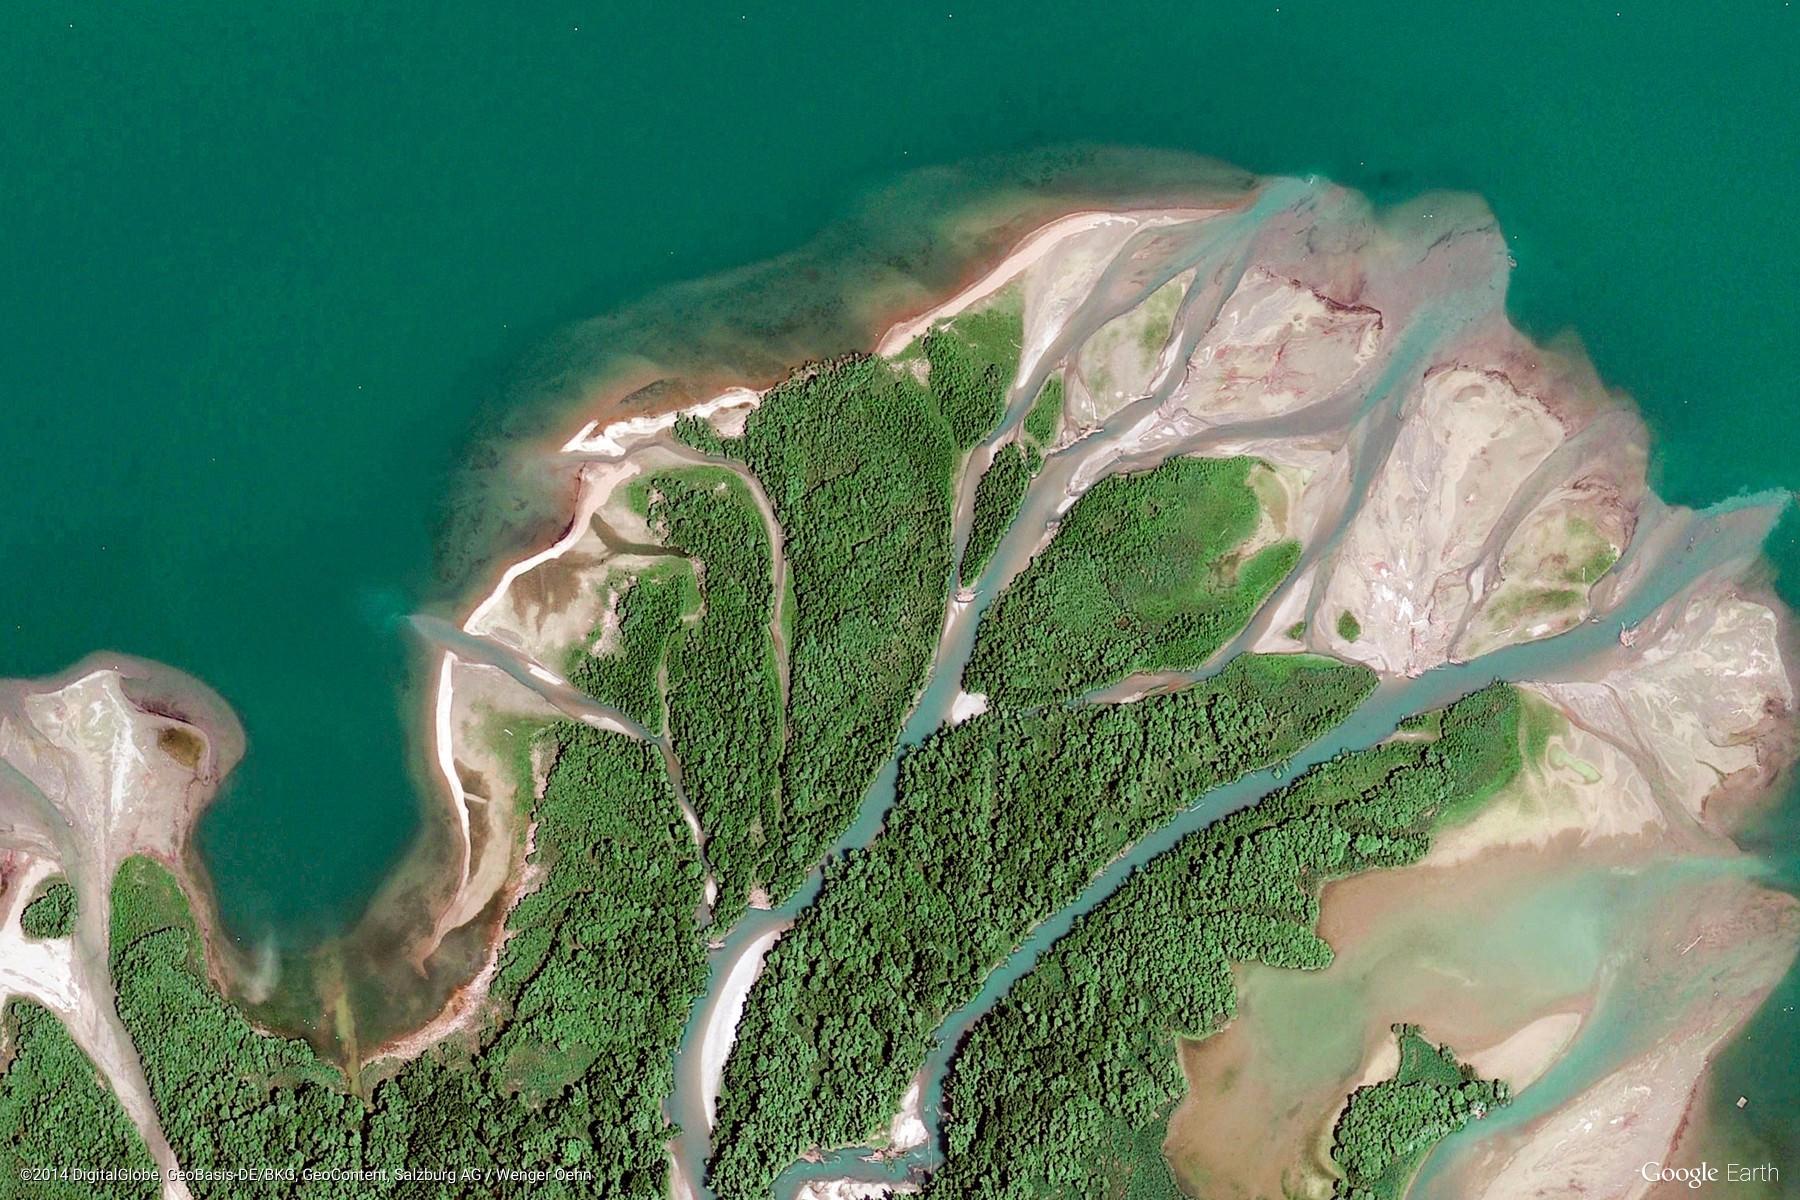 4Ggoogle-earth-view-2263.jpg